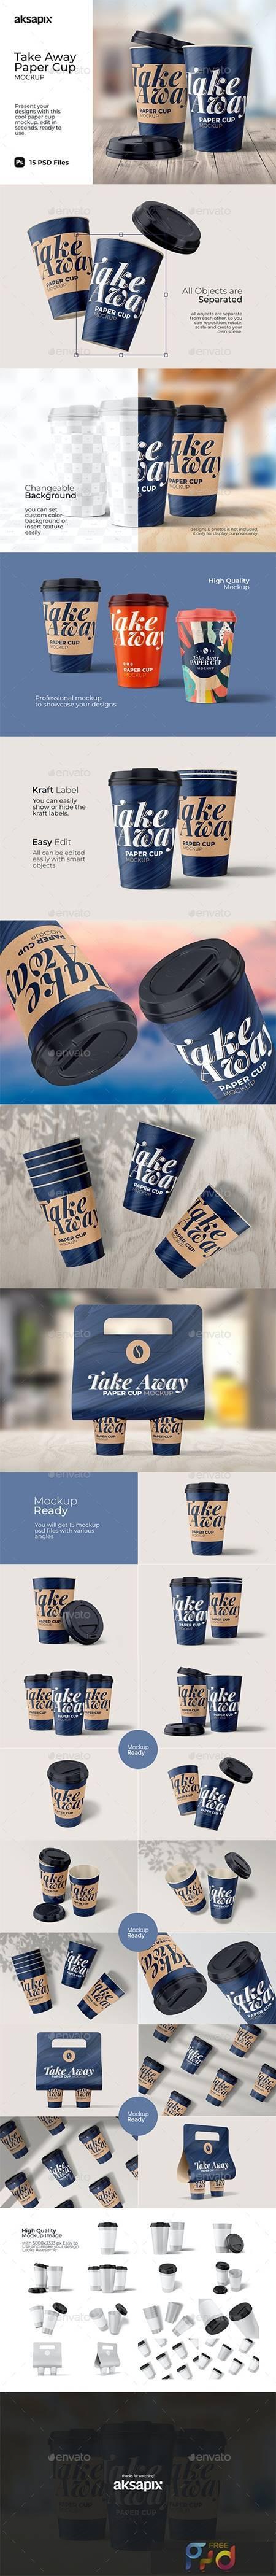 Take Away Paper Cup - Mockup 29600205 1